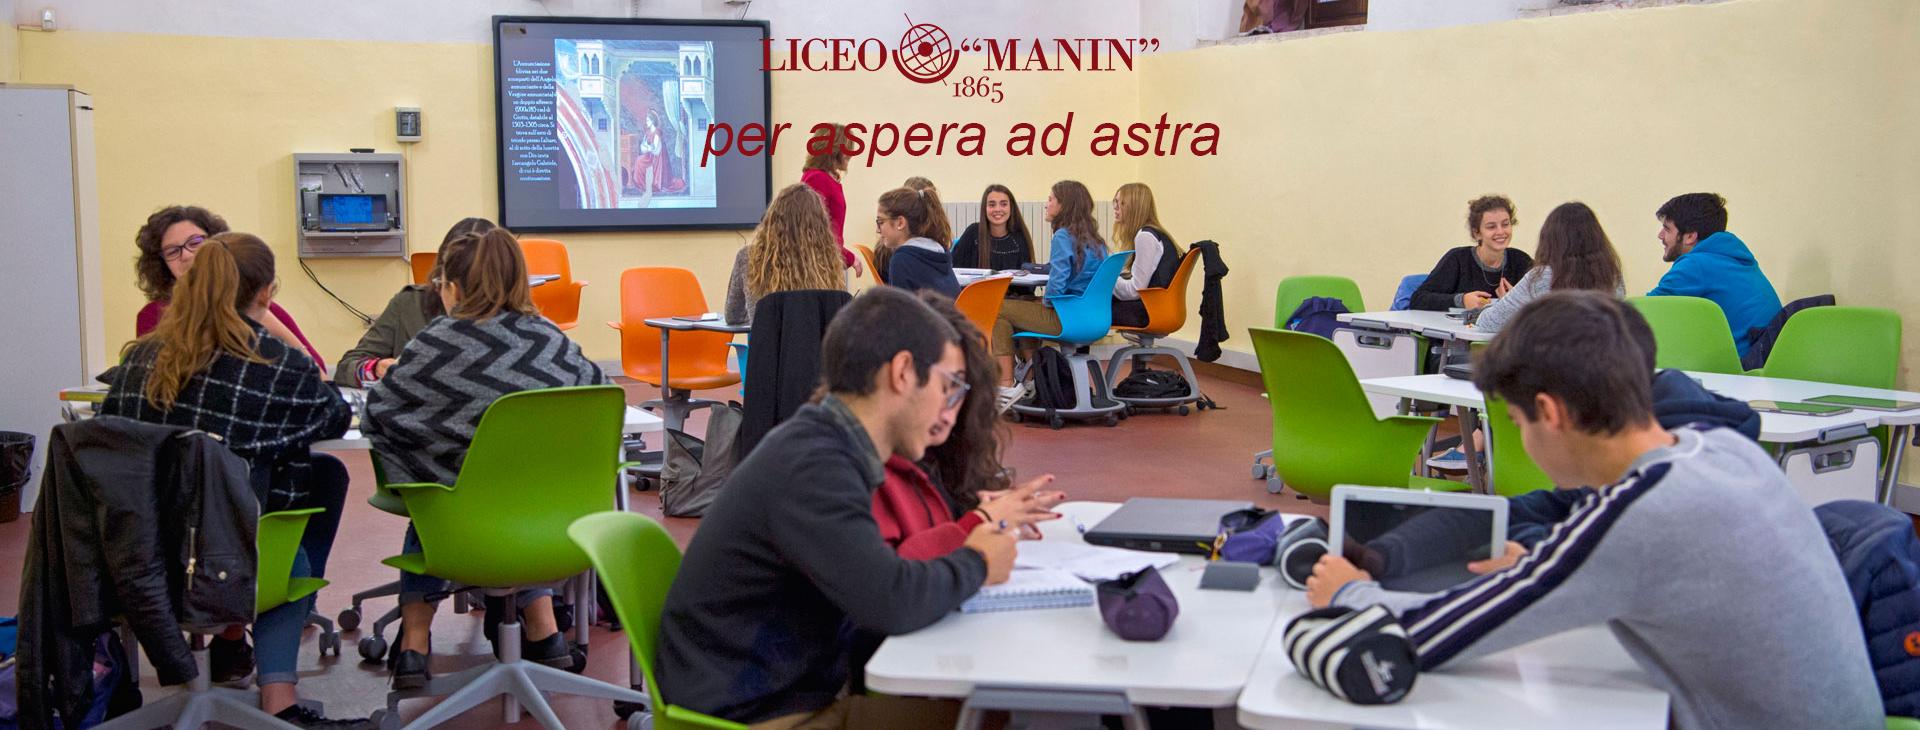 LICEO MANIN